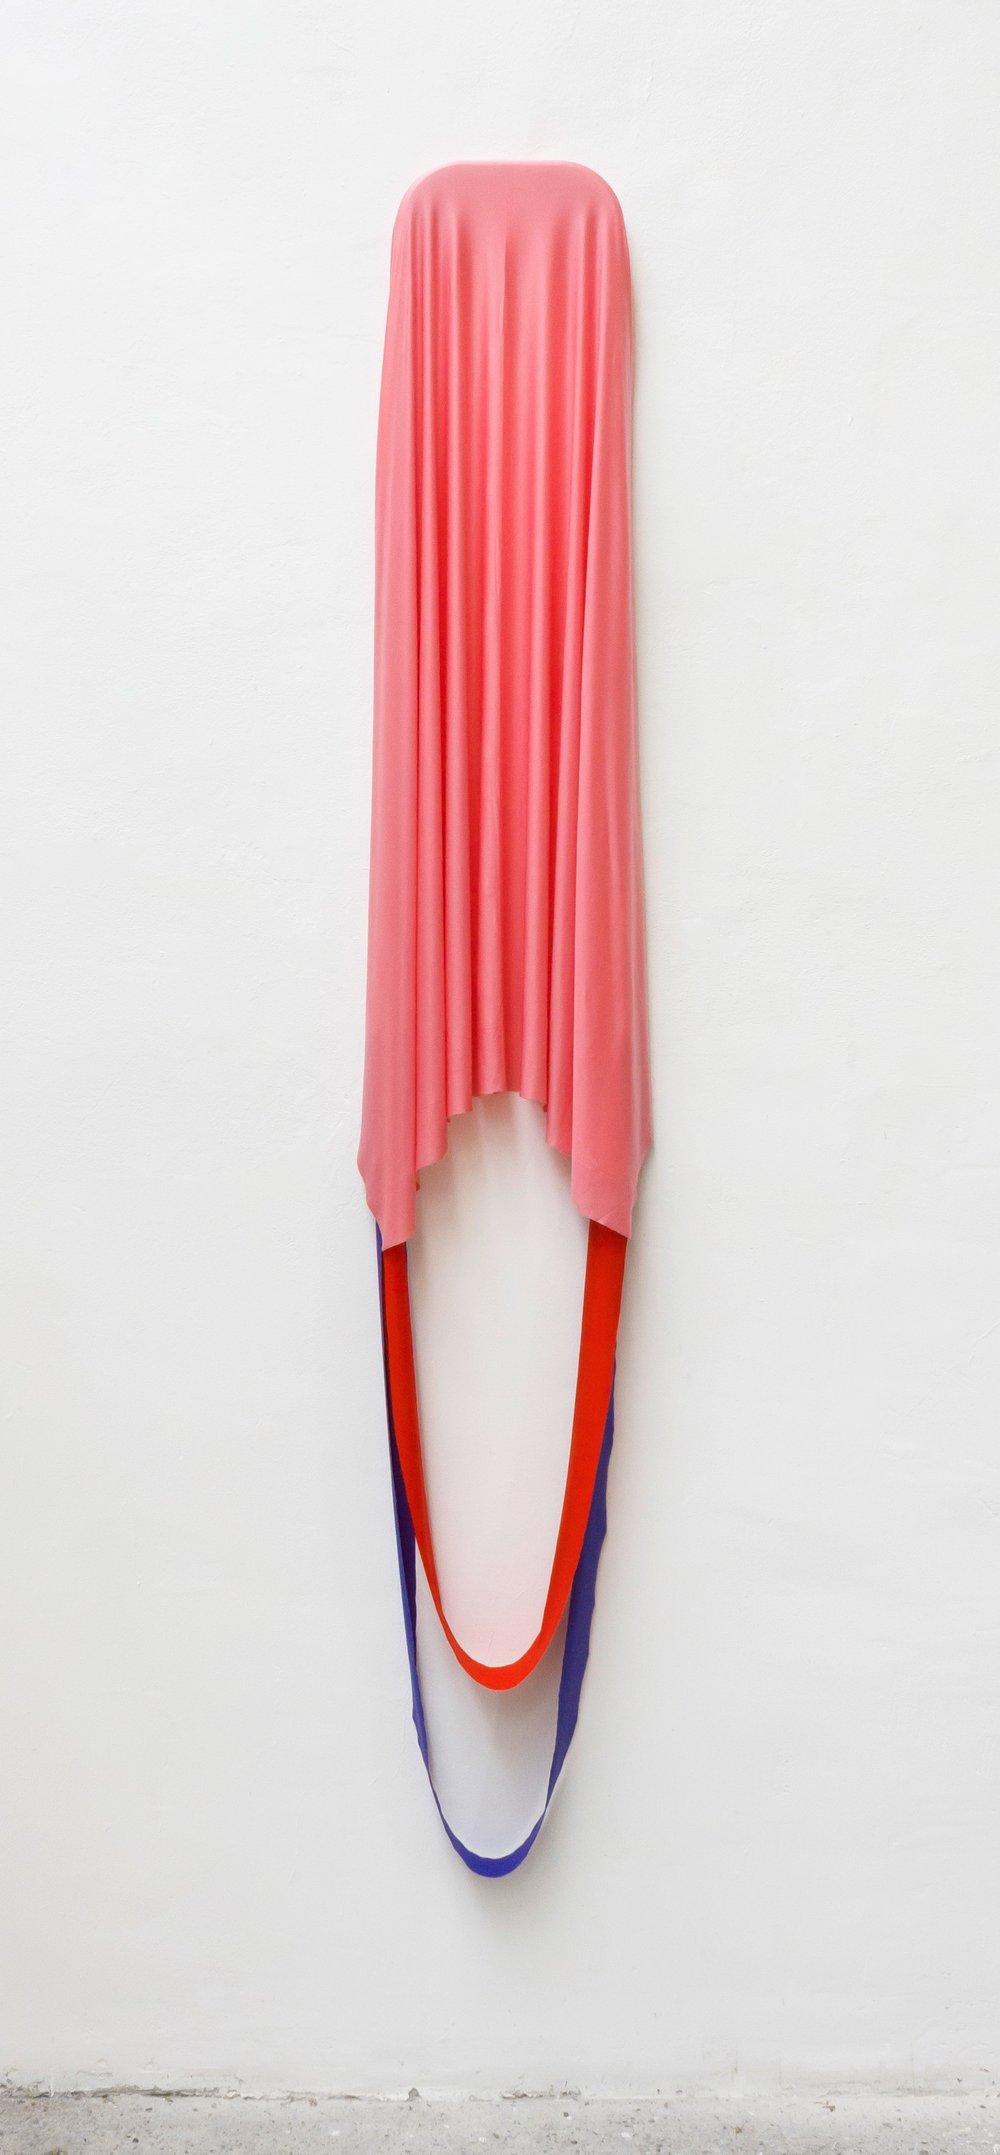 Stileis | Stahl, Textil | 170 x 40 x 5 cm | 2018 | ©GALERIE ALBER